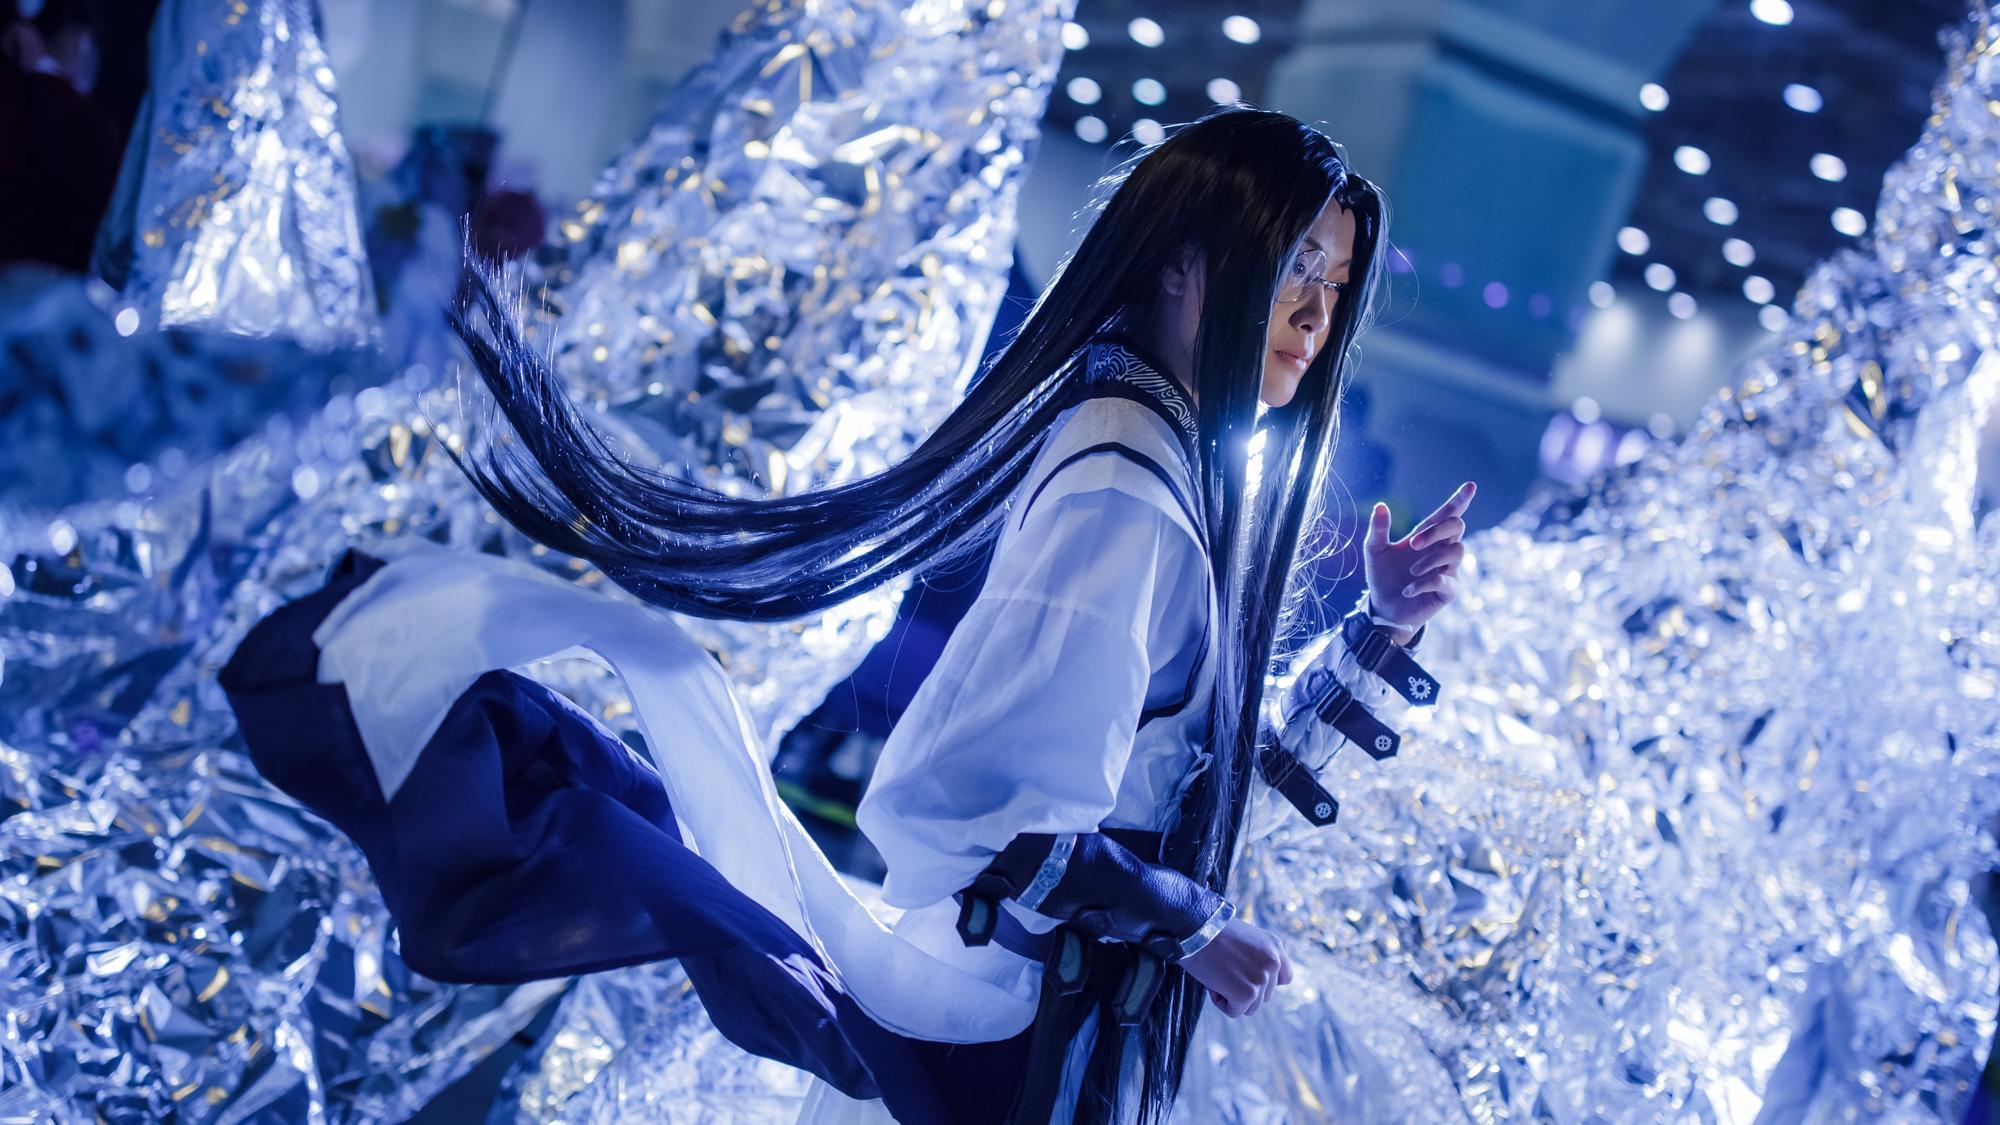 《杀破狼》漫展cosplay【CN:少毒】-第2张